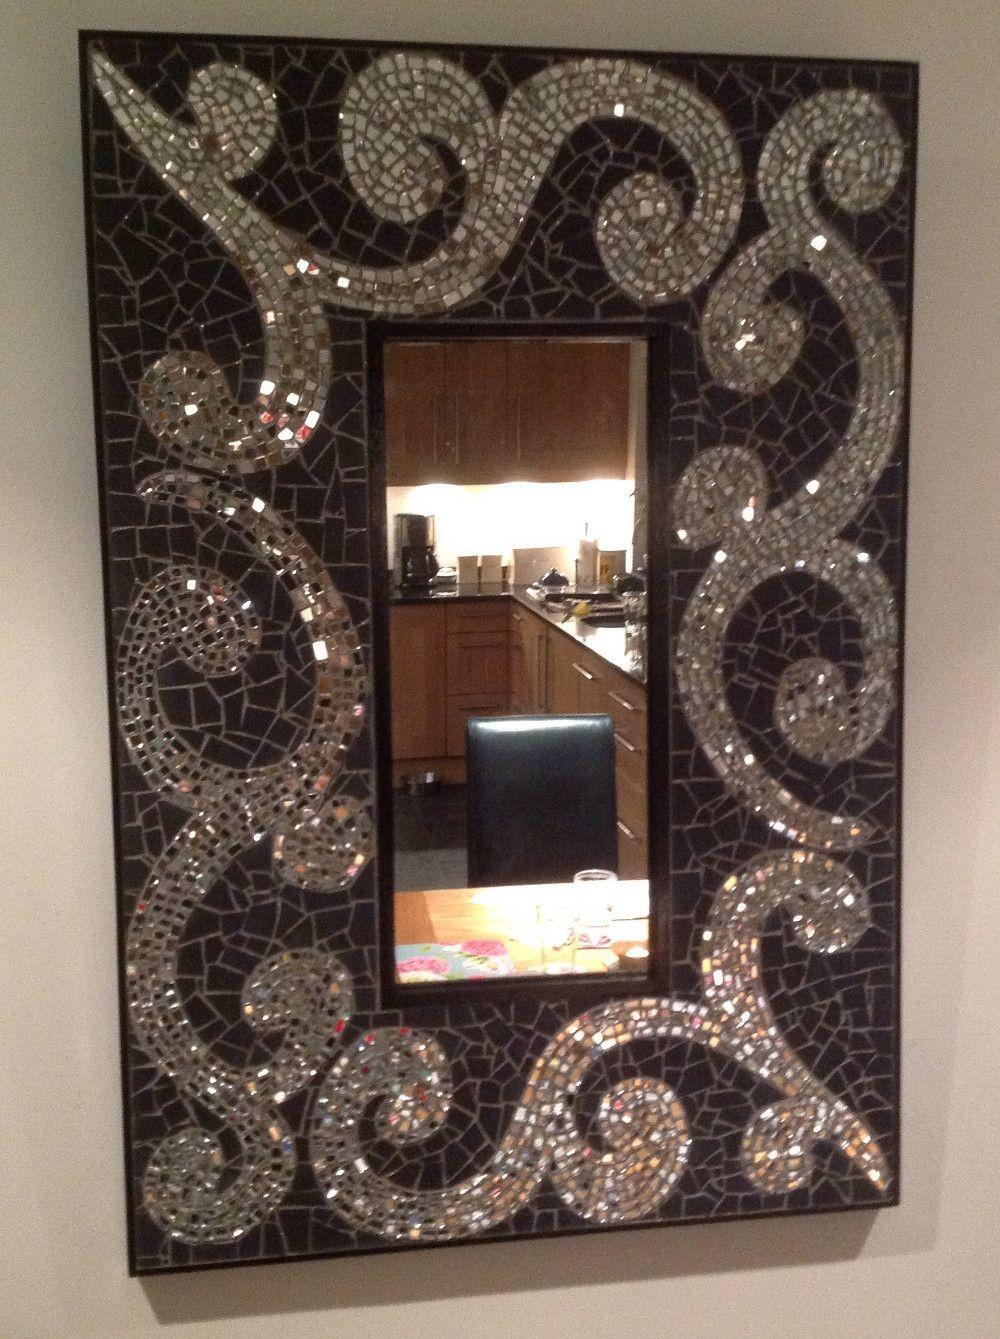 Original Mosaic Bathroom Mirror Art Matt Black Mirror Glass Tiles